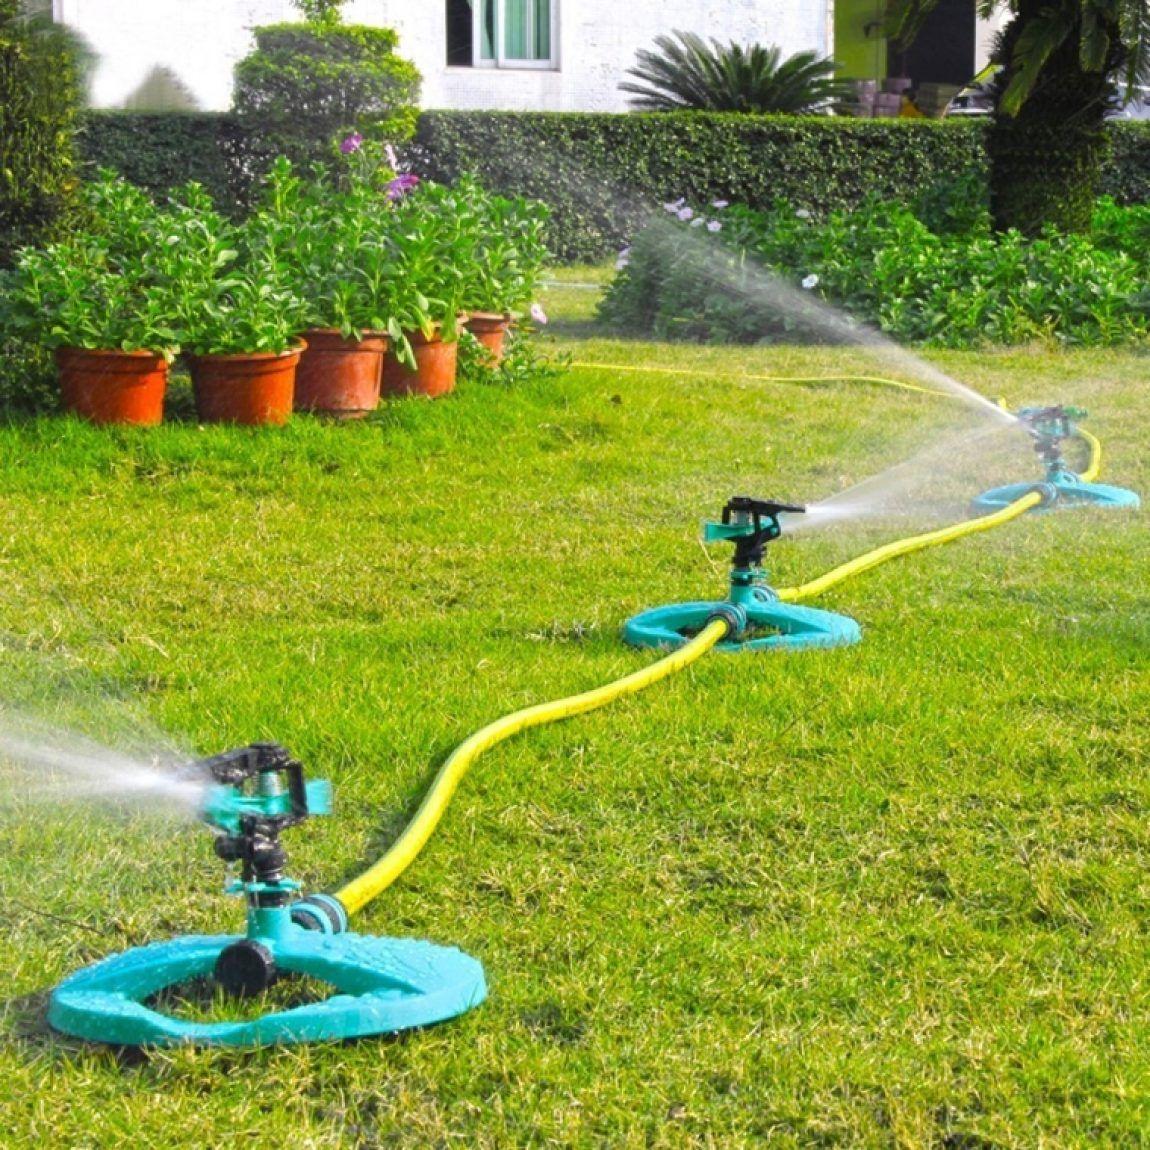 Water Sprinkler System Impulse Long Range Sprinklers for Garden and Lawn